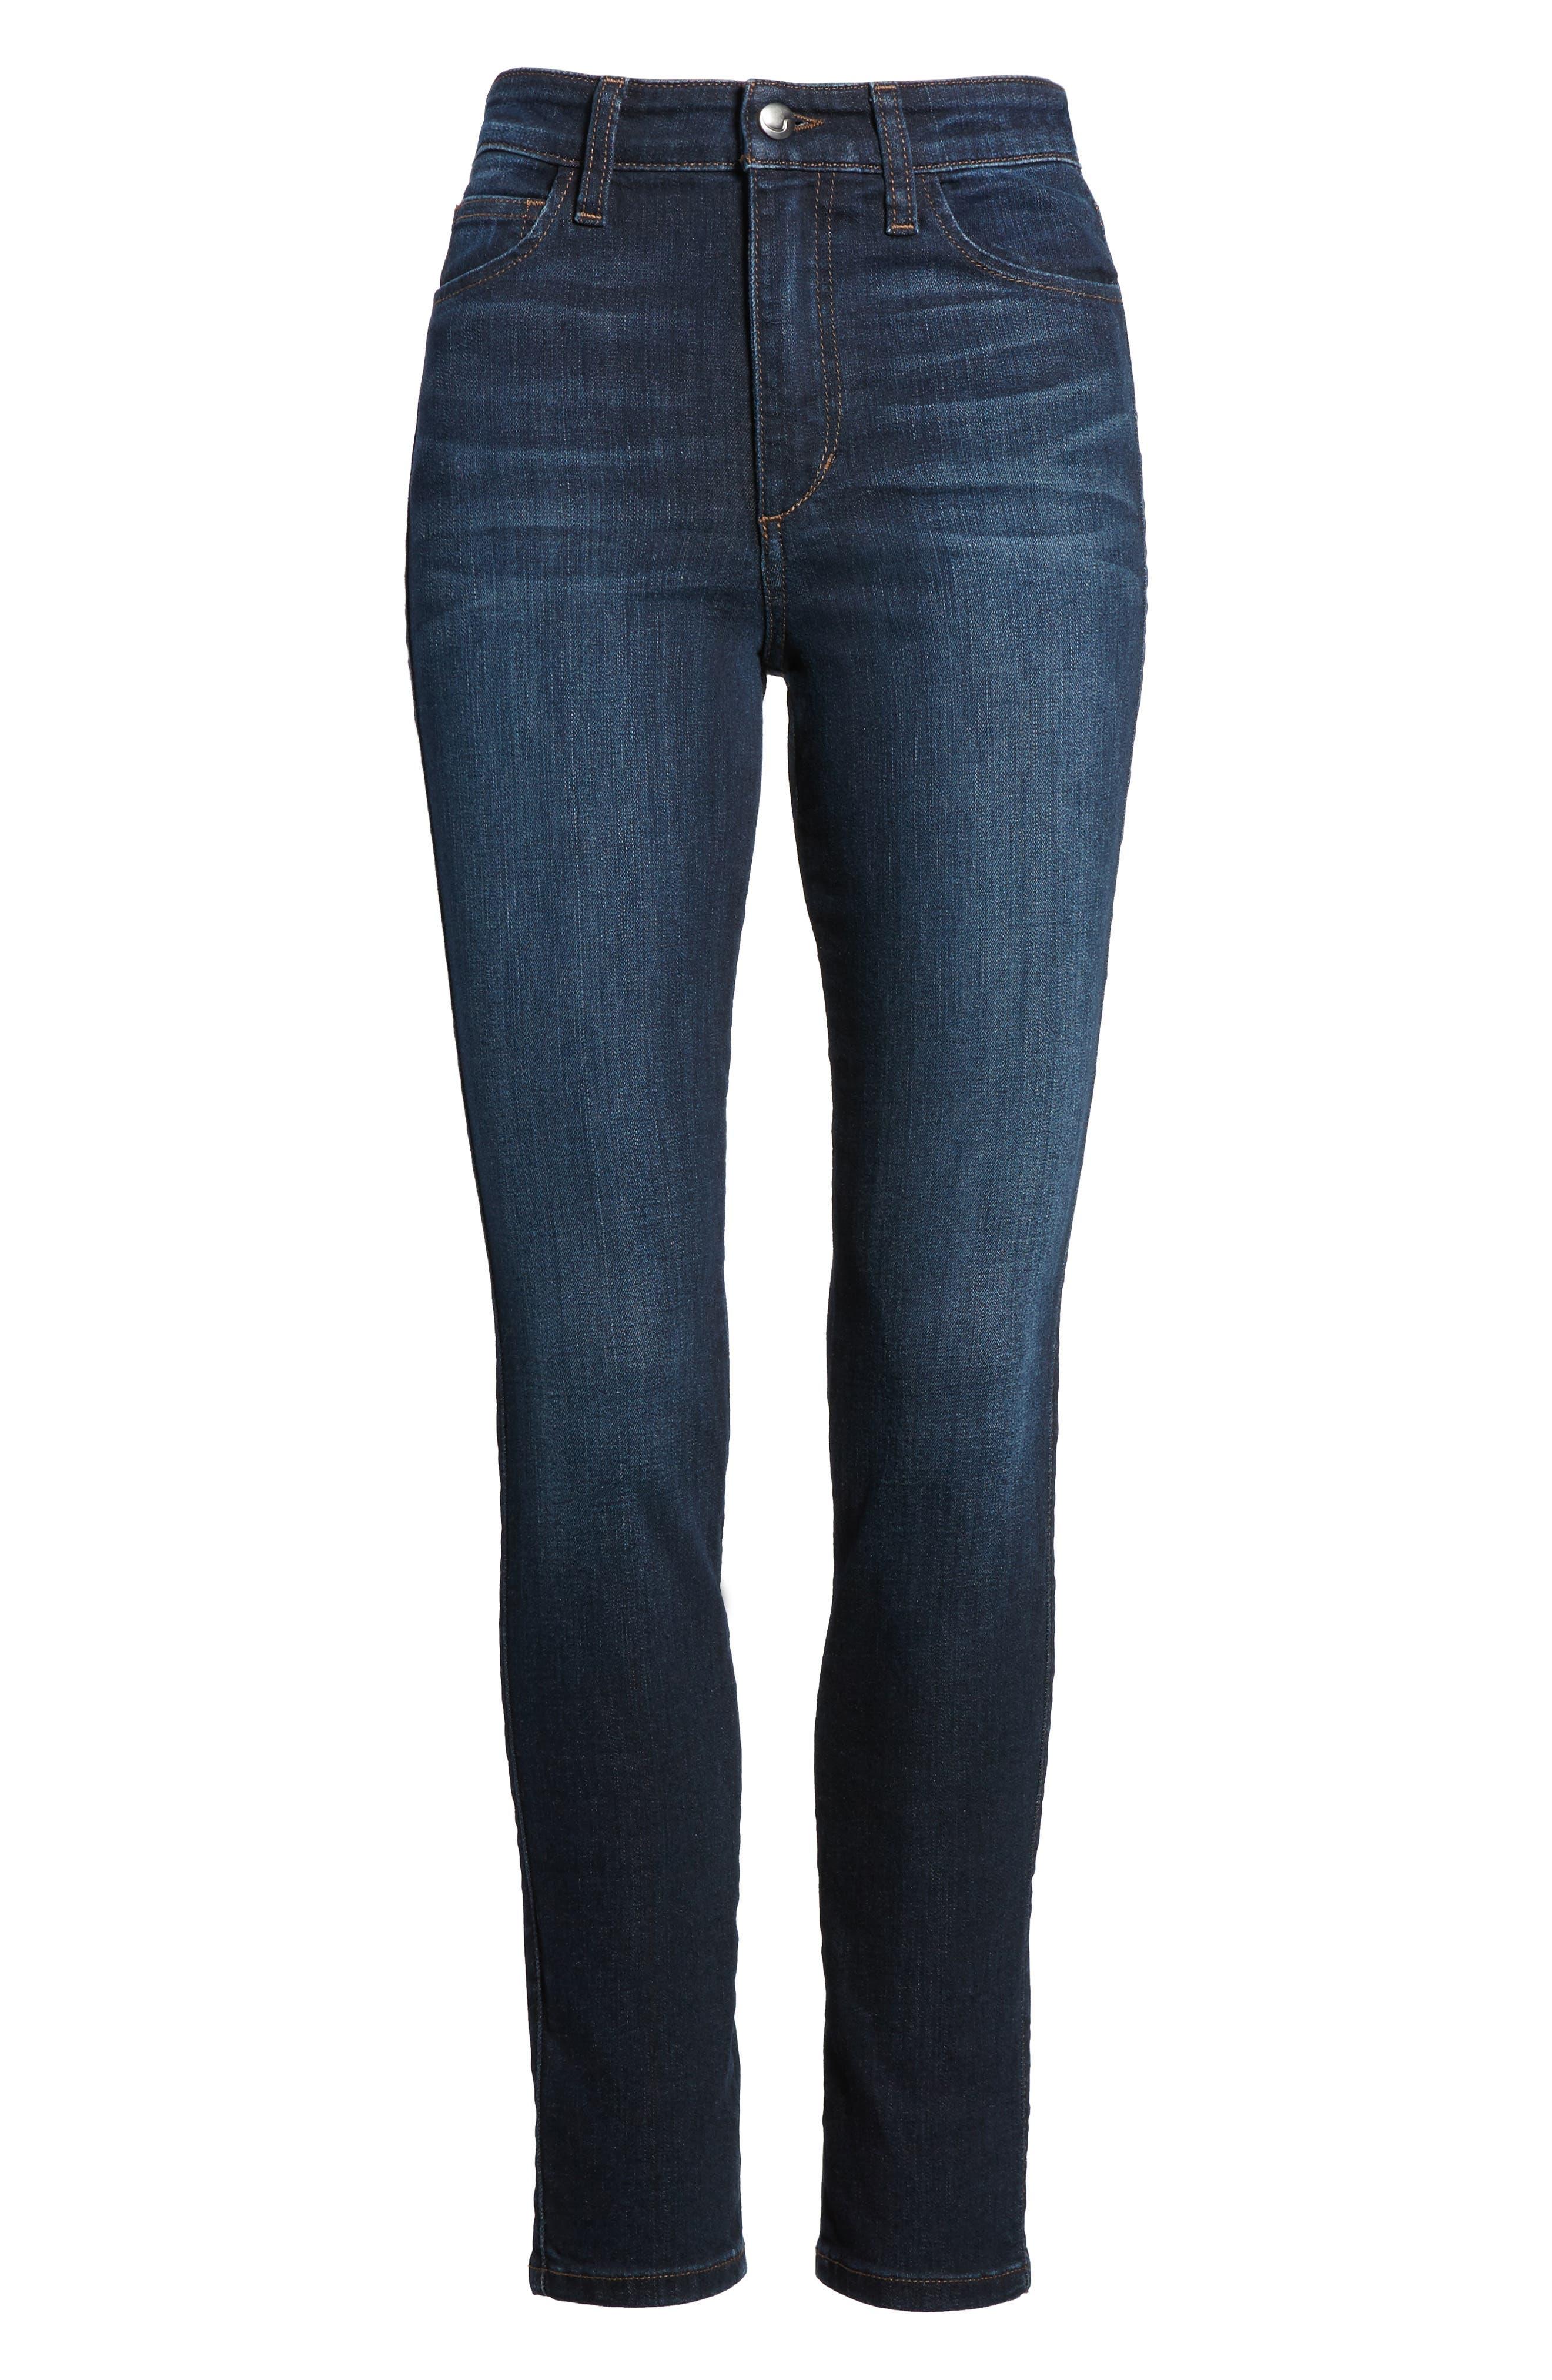 Charlie High Waist Skinny Jeans,                             Alternate thumbnail 6, color,                             Narissa